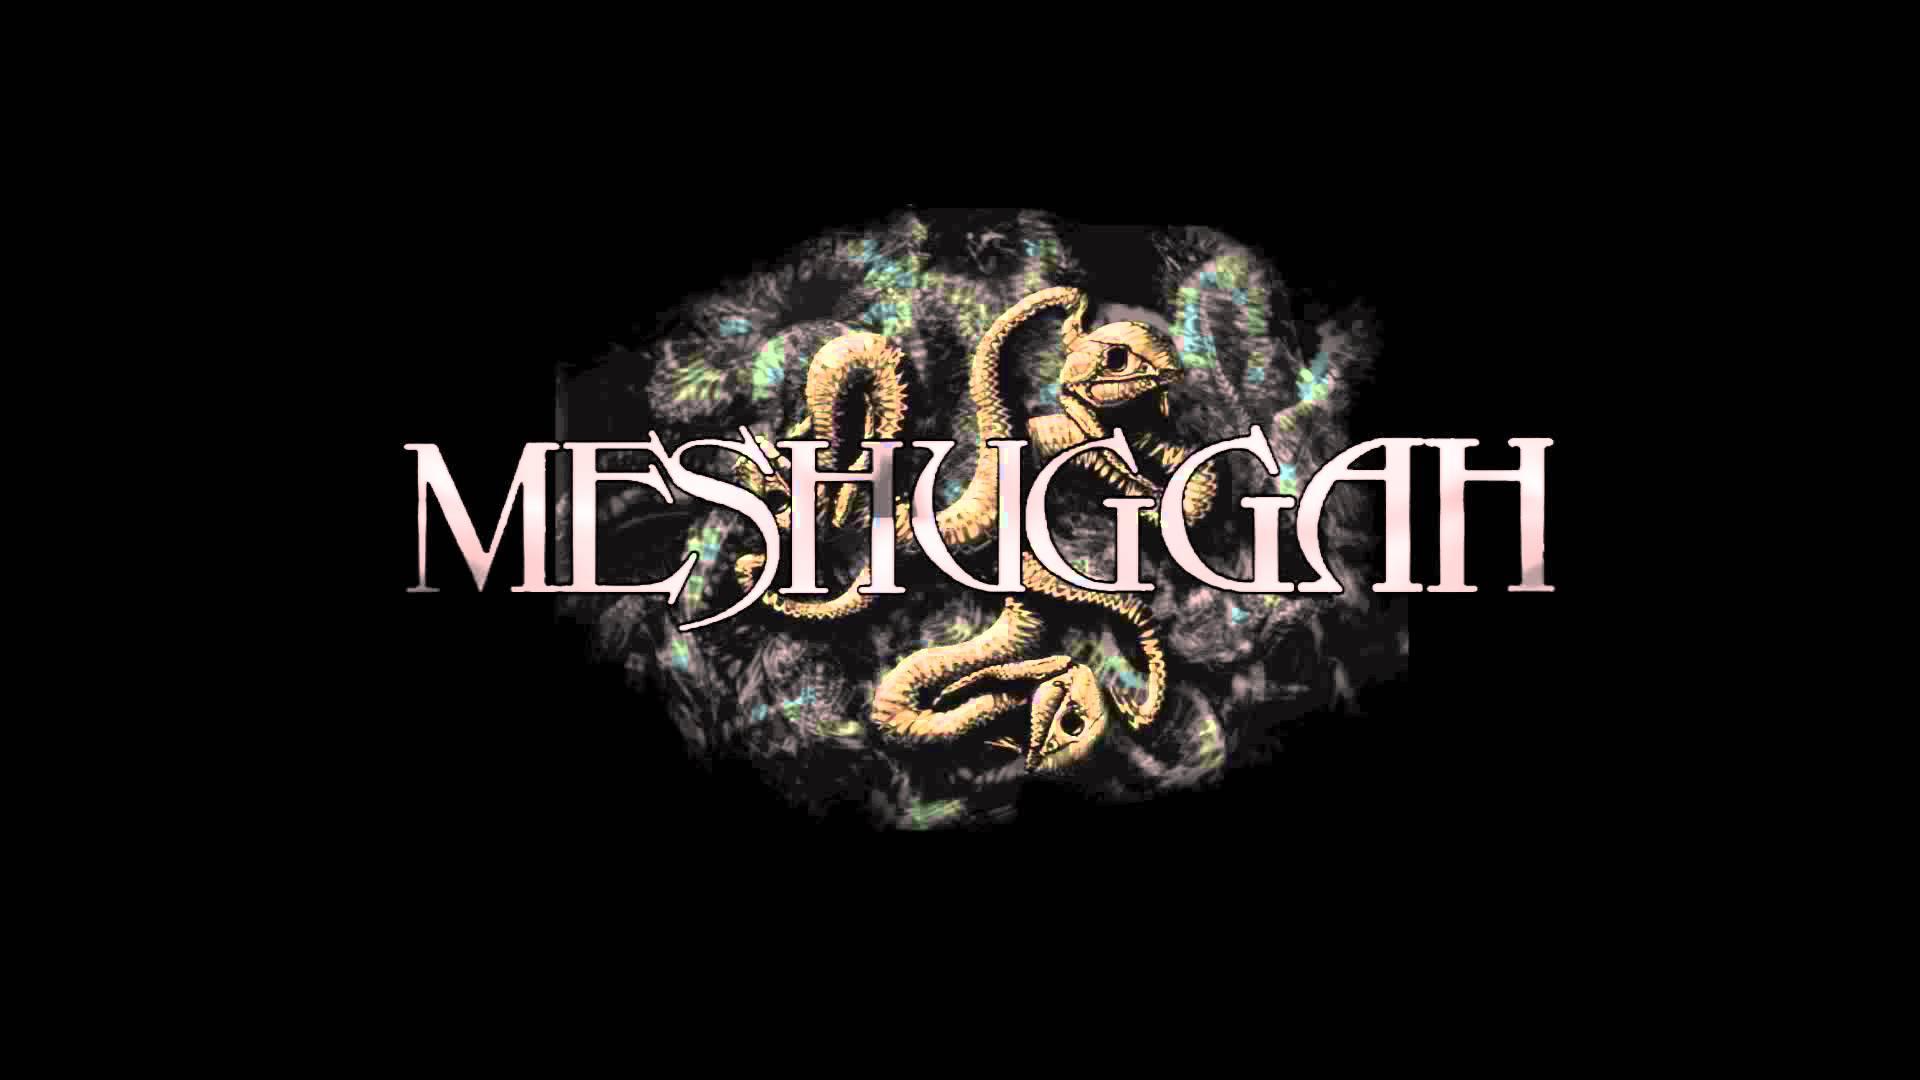 Meshuggah Entrapment Echoed 1920x1080